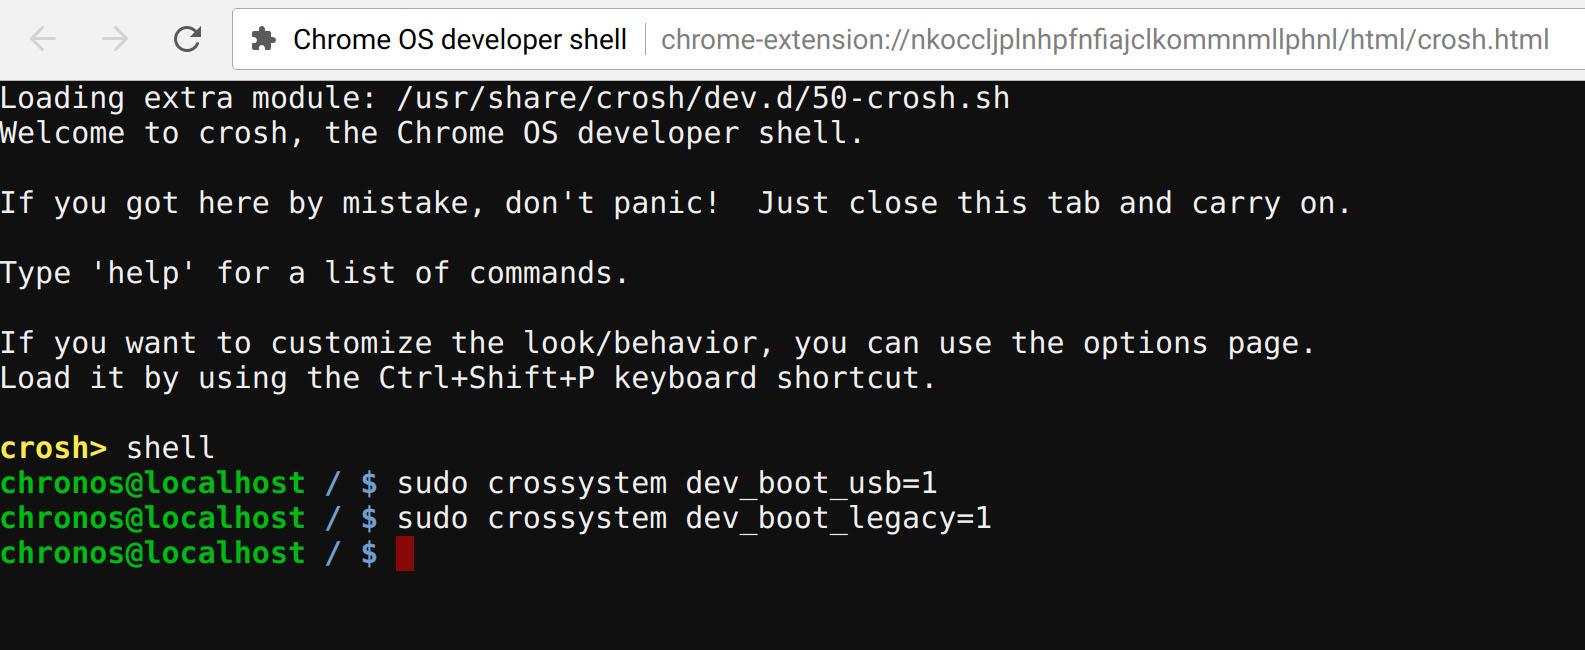 Google Chrome OS Setup Legacy And USB Boot